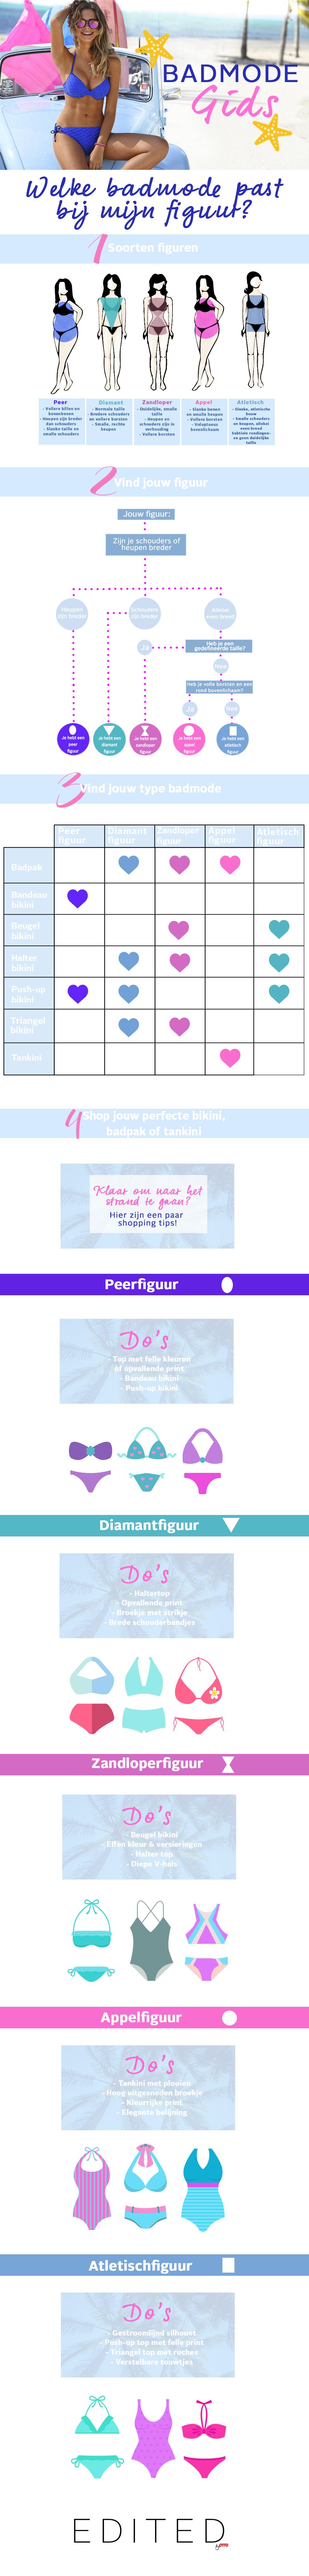 Badmode infographic